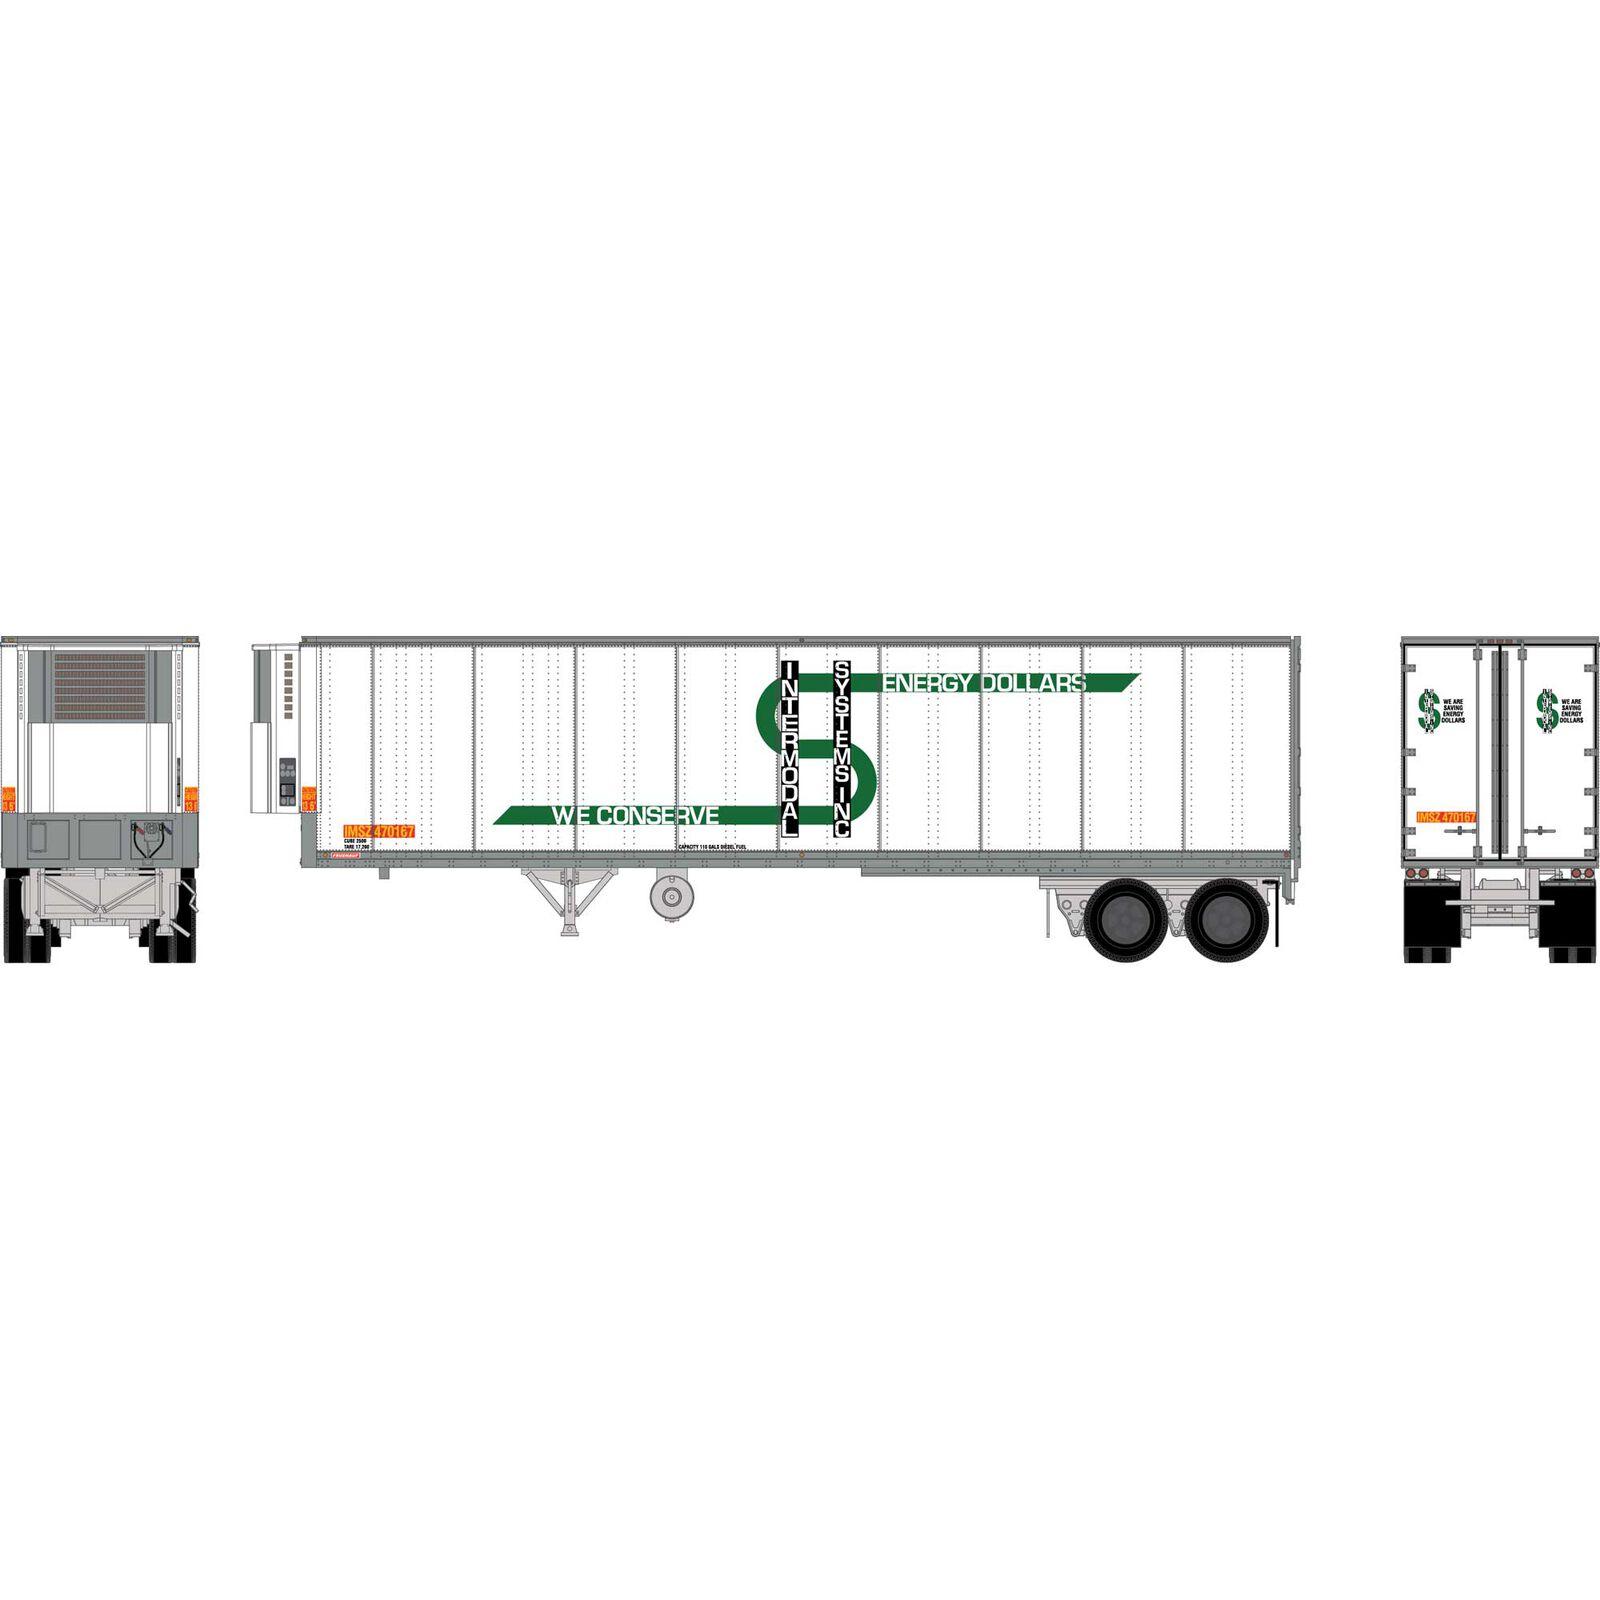 HO RTR 40' Fruehauf Z-Van Trailer, IMSZ #470167